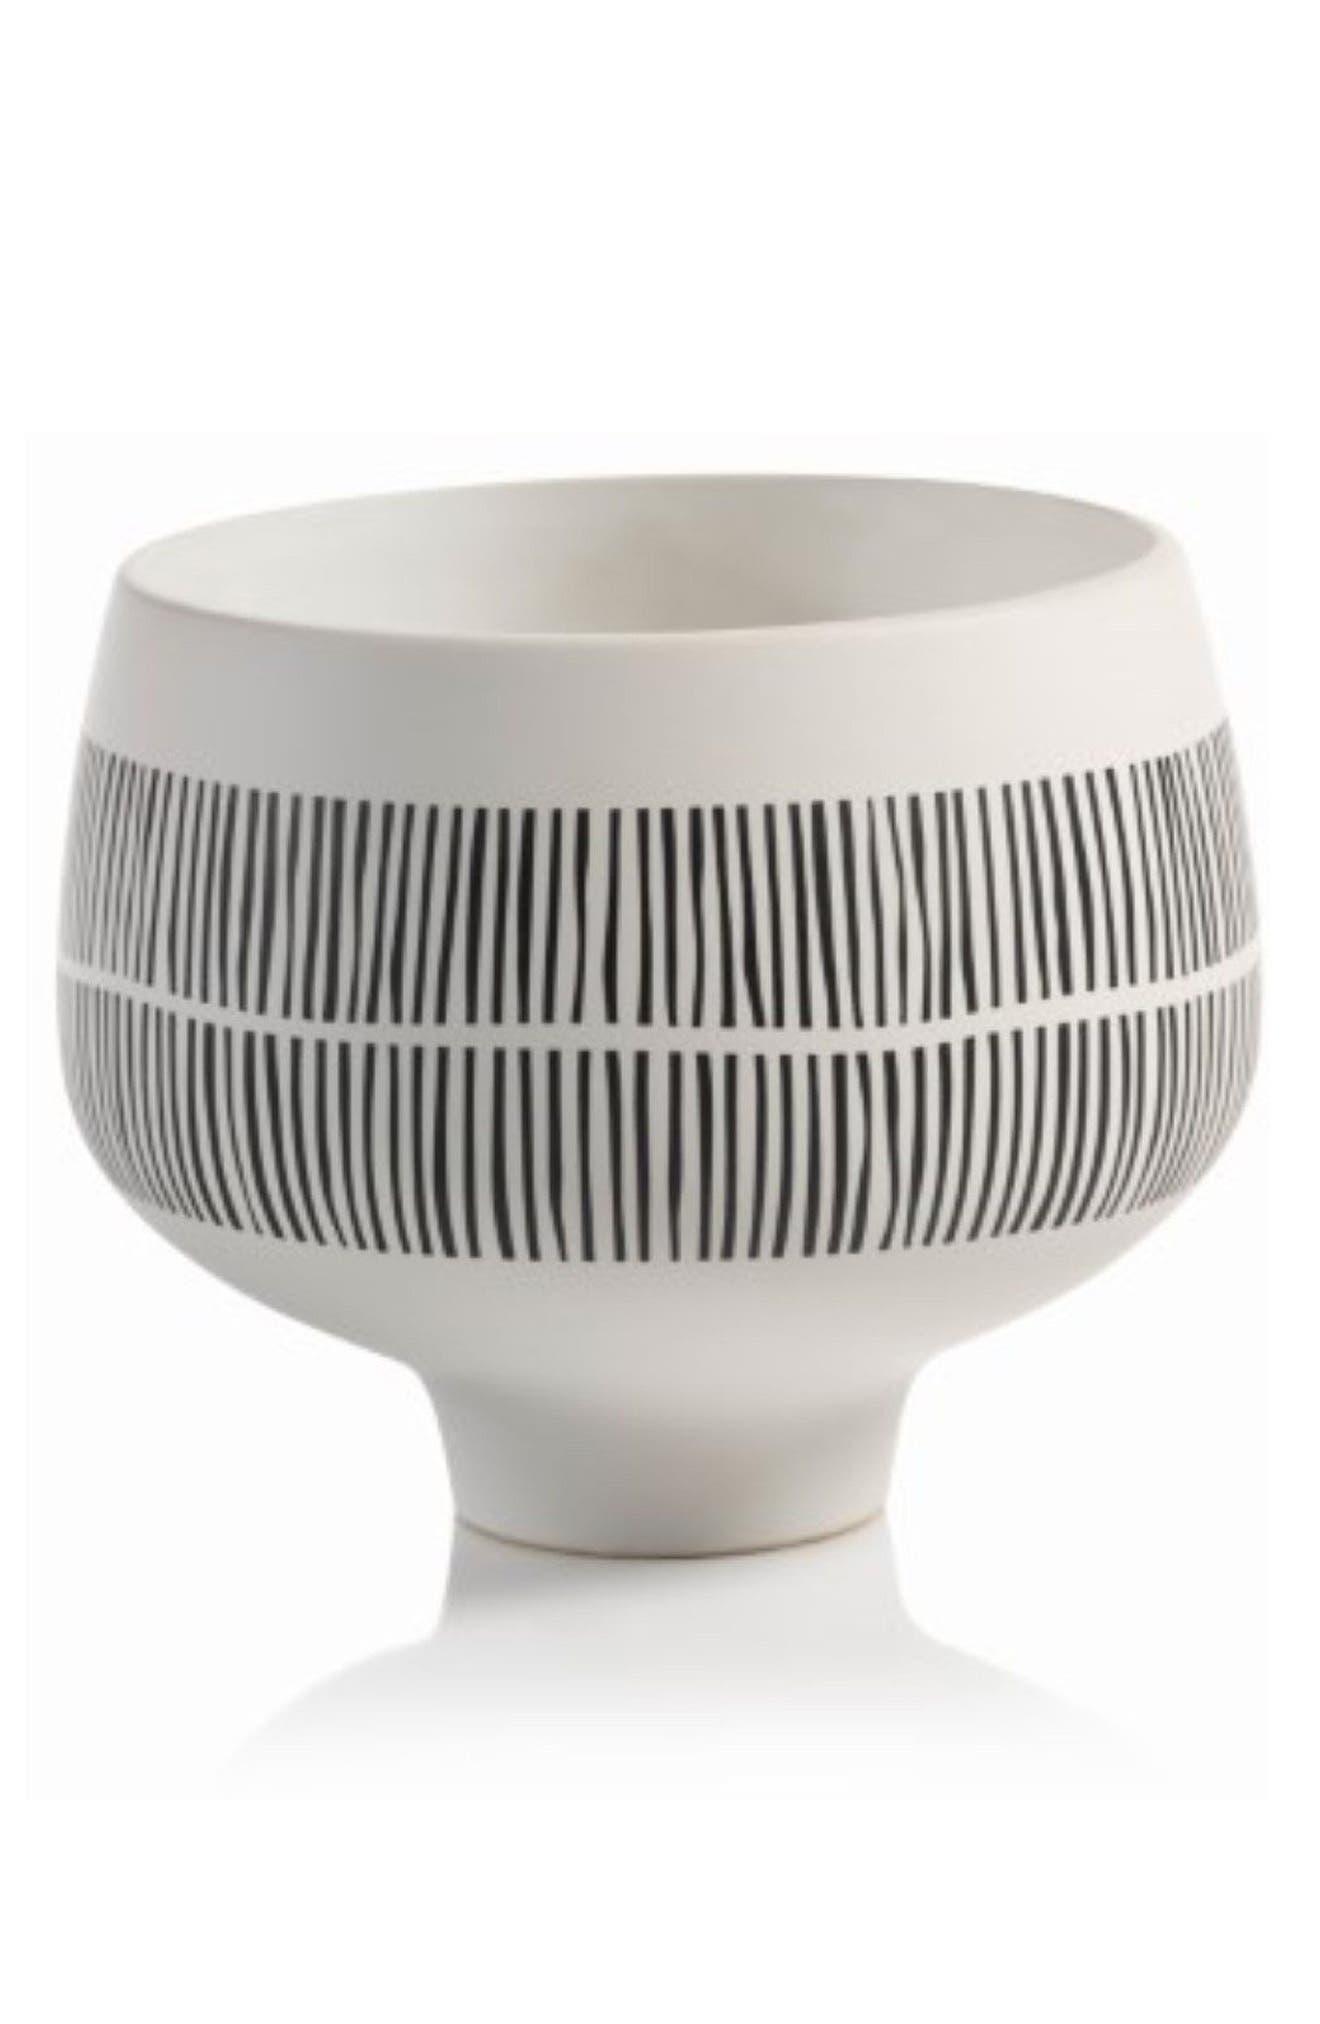 Marquesa Ceramic Pedestal Bowl,                             Main thumbnail 1, color,                             100